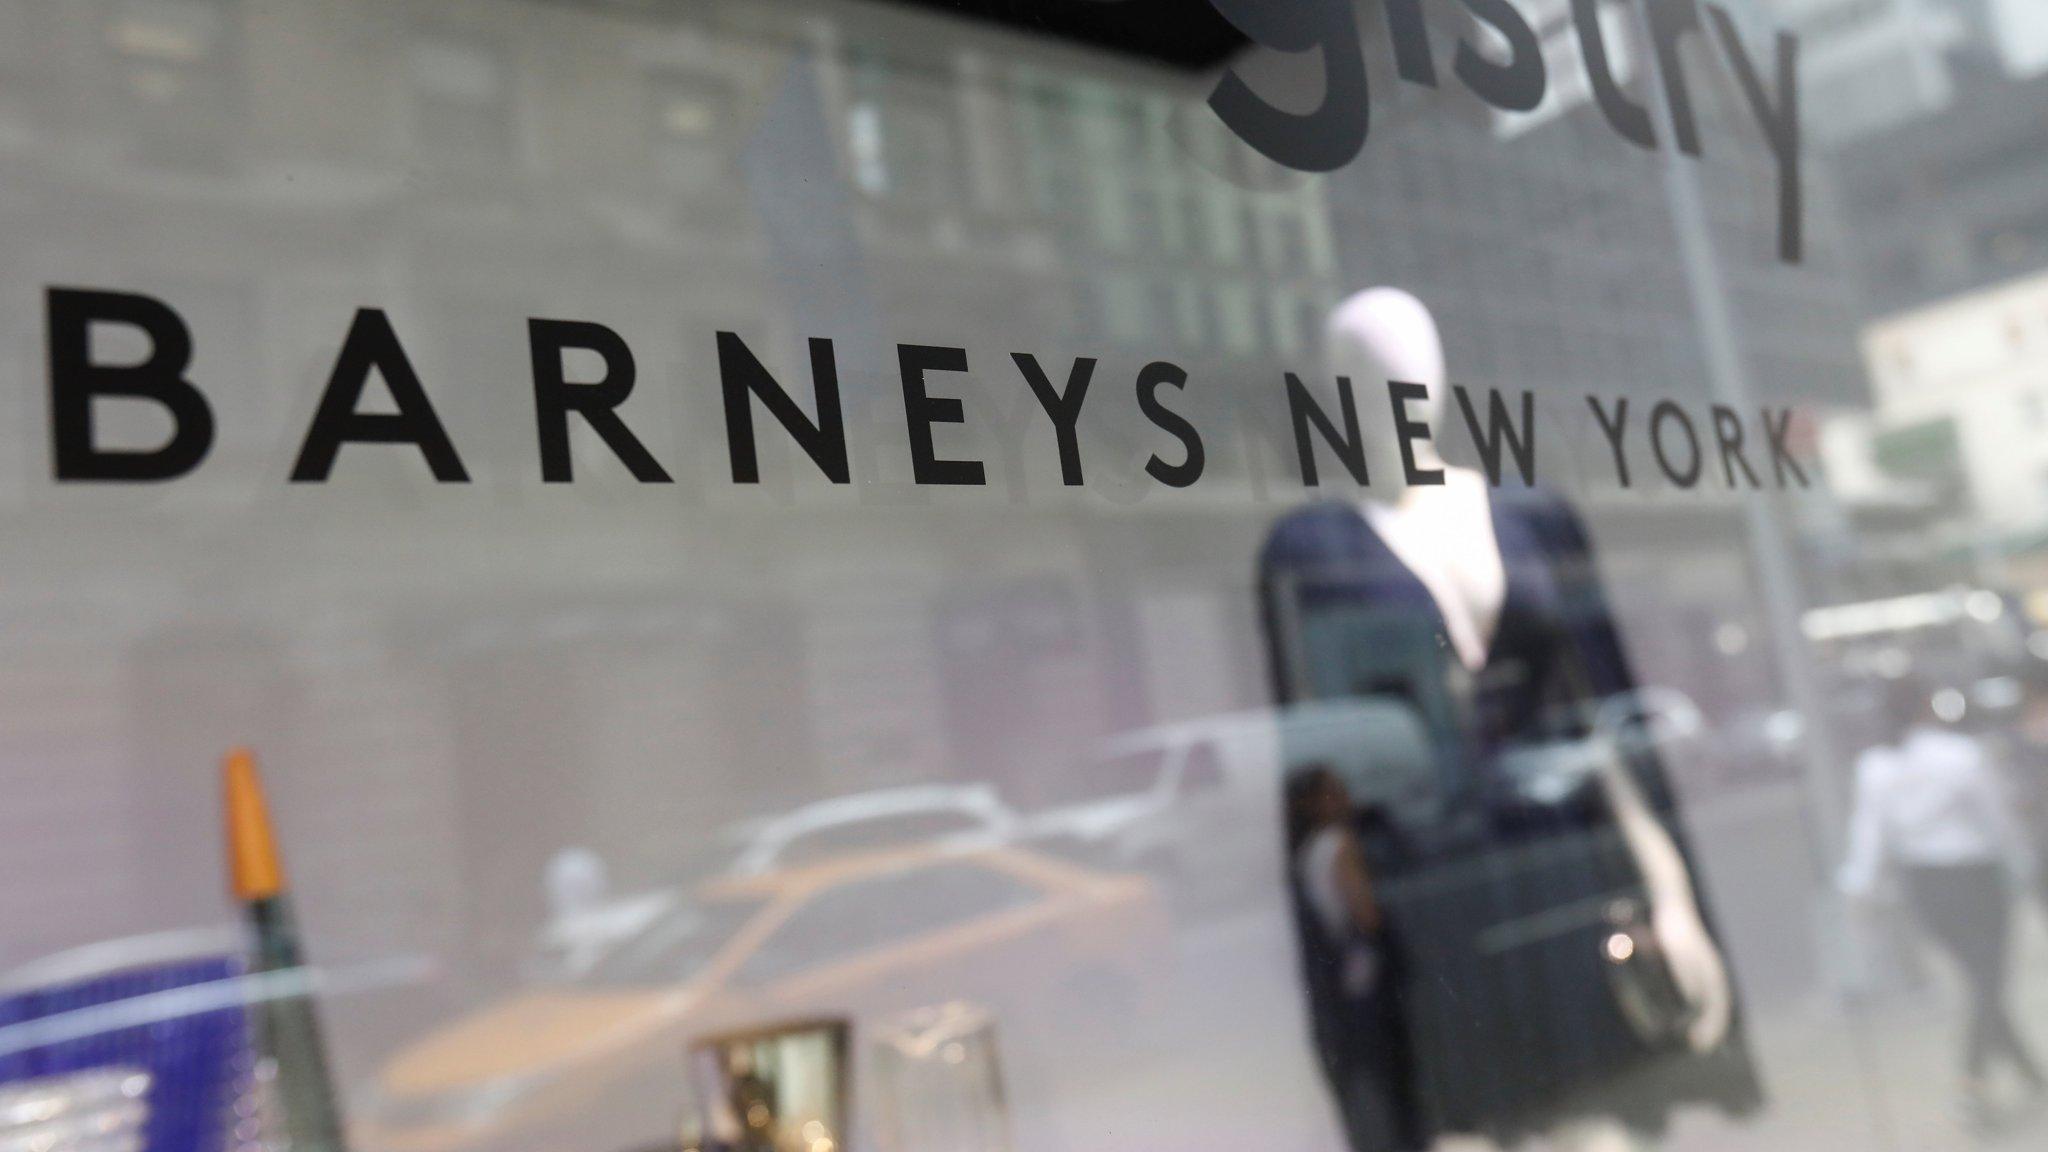 Barneys New York złożył wniosek o bankructwo